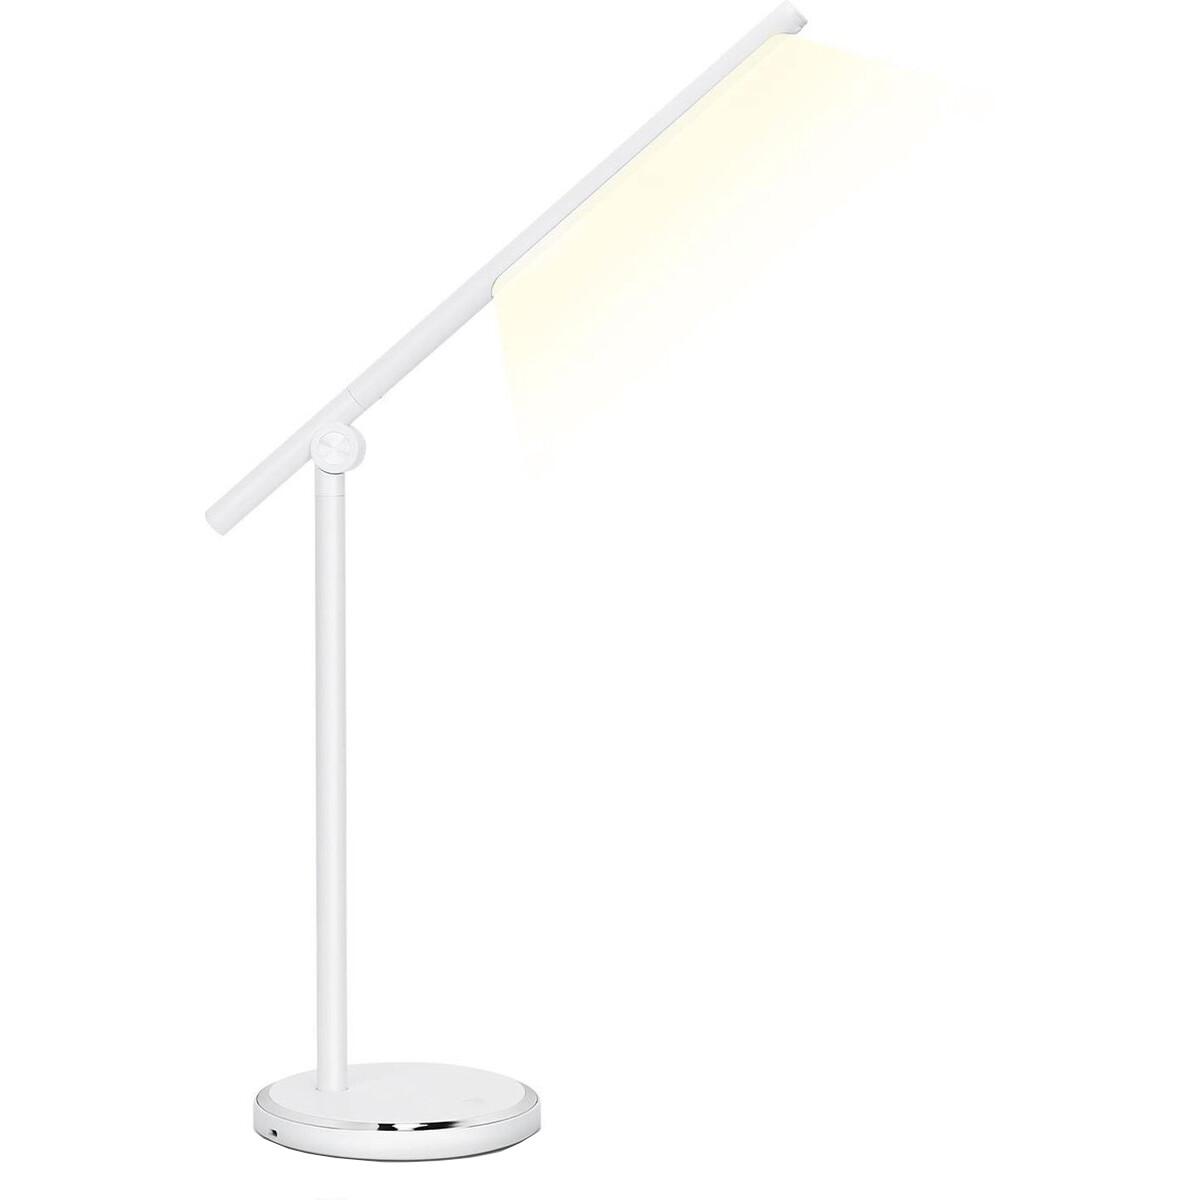 LED Tafellamp - Aigi Libo - 8W - USB Oplaadfunctie - Aanpasbare Kleur - Dimbaar - Rechthoek - Mat Wit - Aluminium